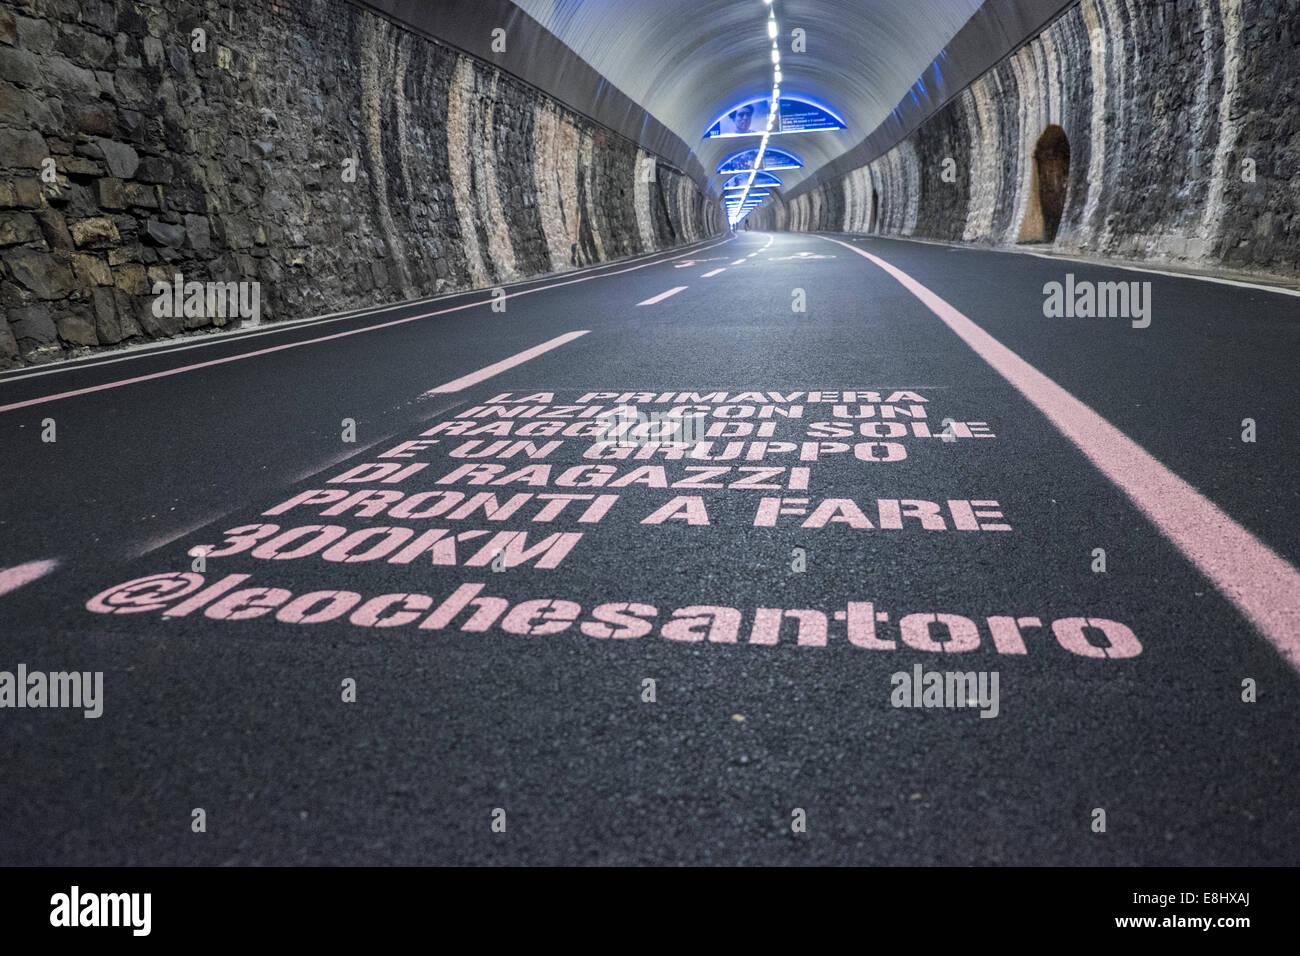 Capo Nero túnel con Giro d'Italia, la decoración, la Riviera dei Fiori, San Remo, Liguria, Italia Imagen De Stock